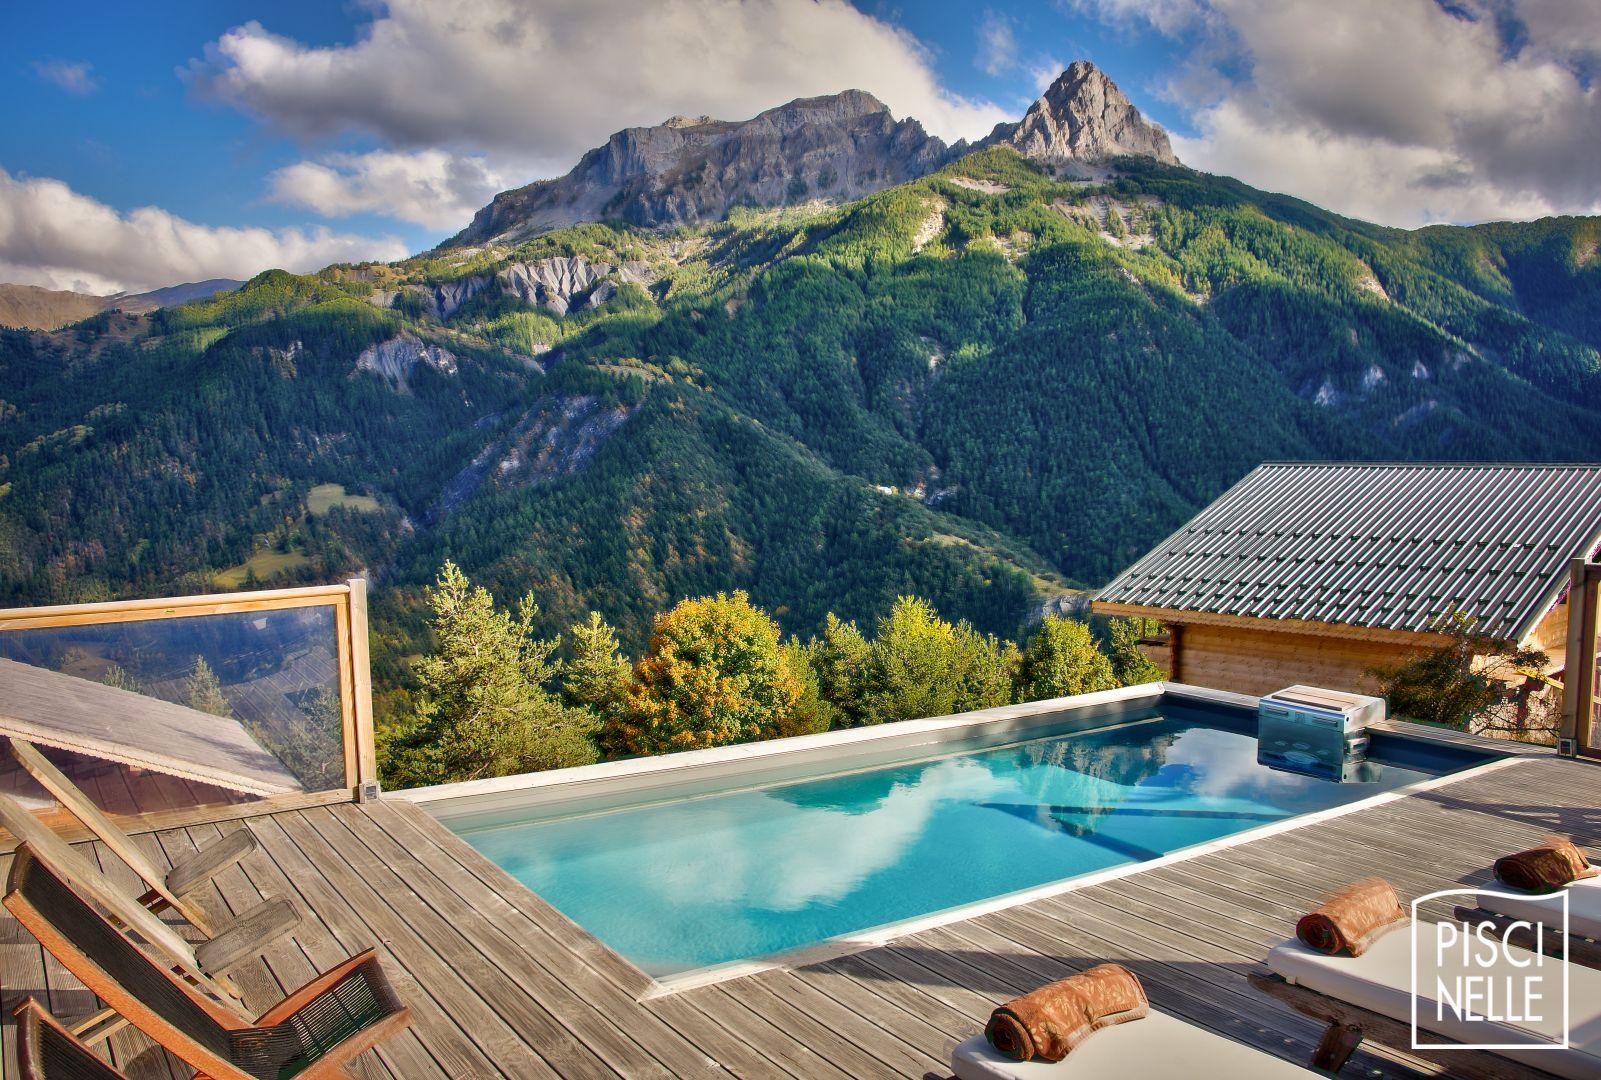 Piscine En Bois Alsace piscinelle : fabricant de piscine en alsace lorraine